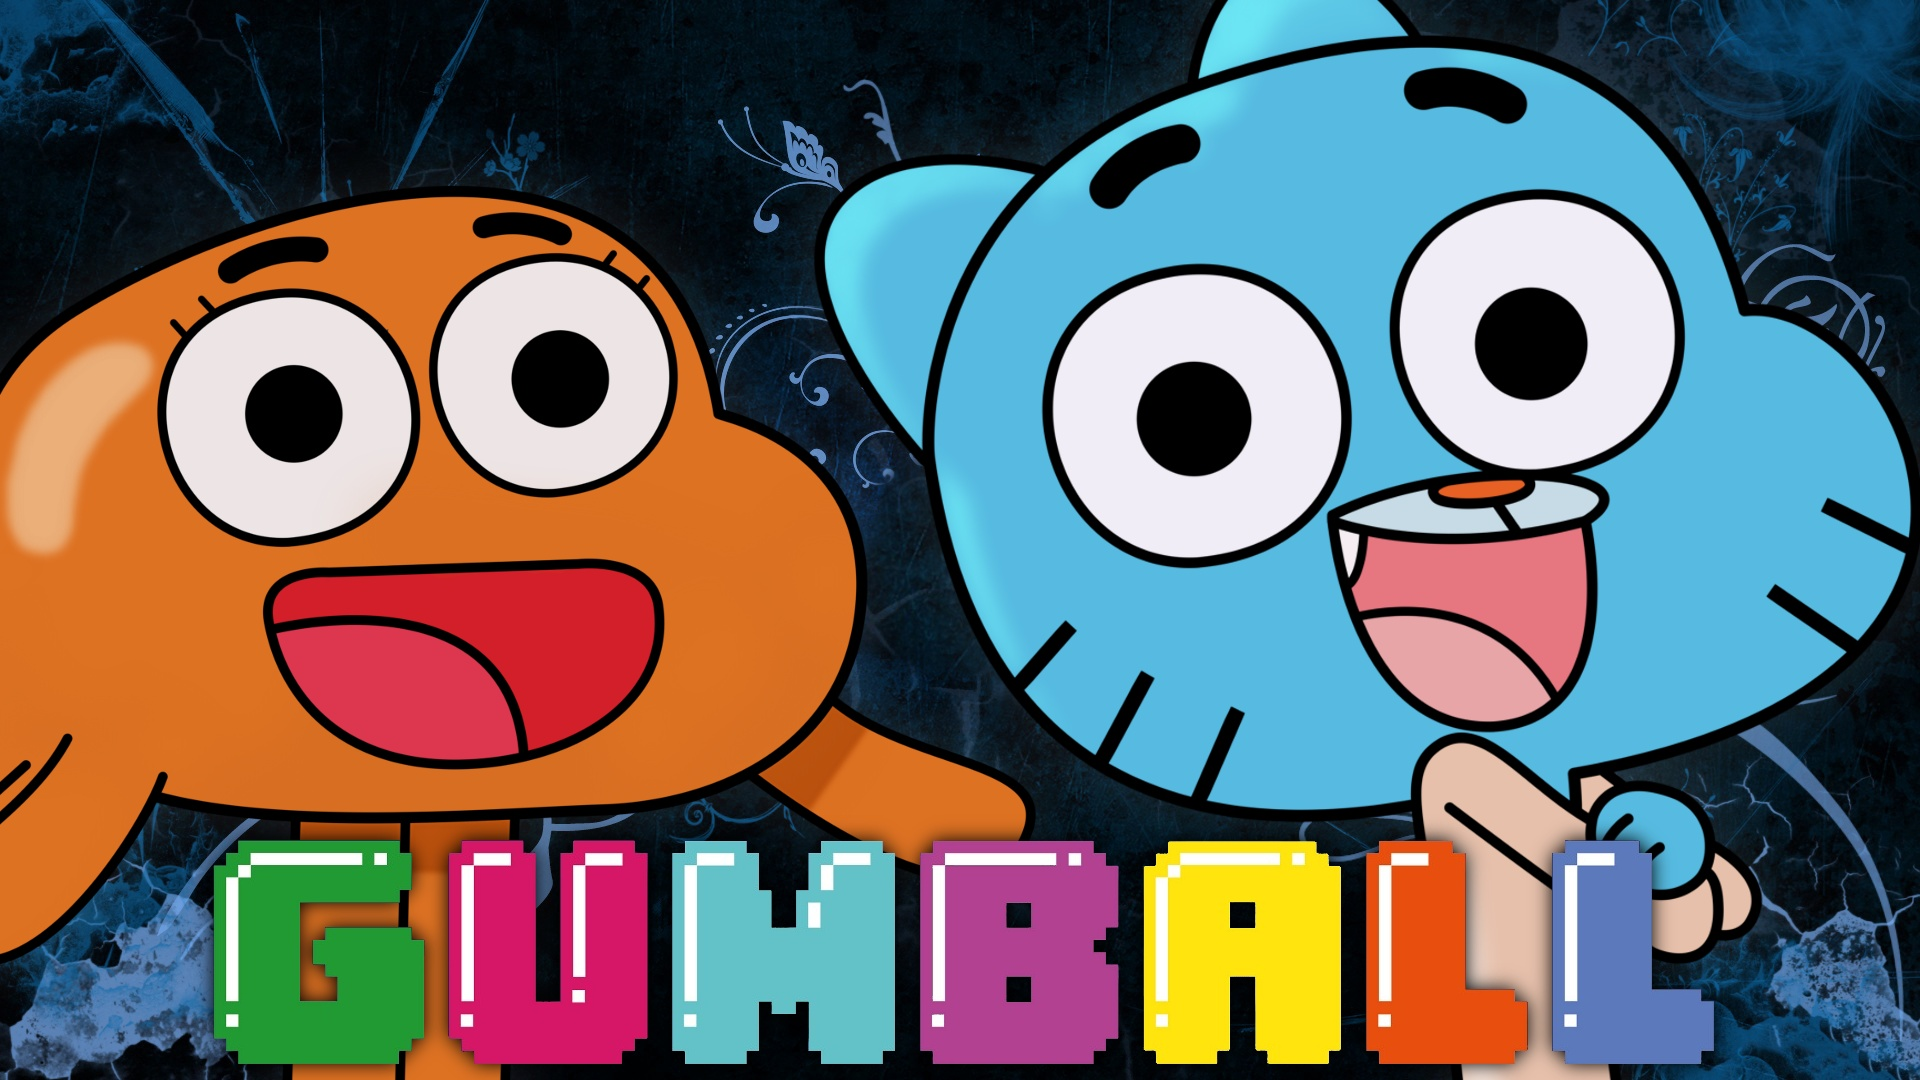 World Of Gumball free photo